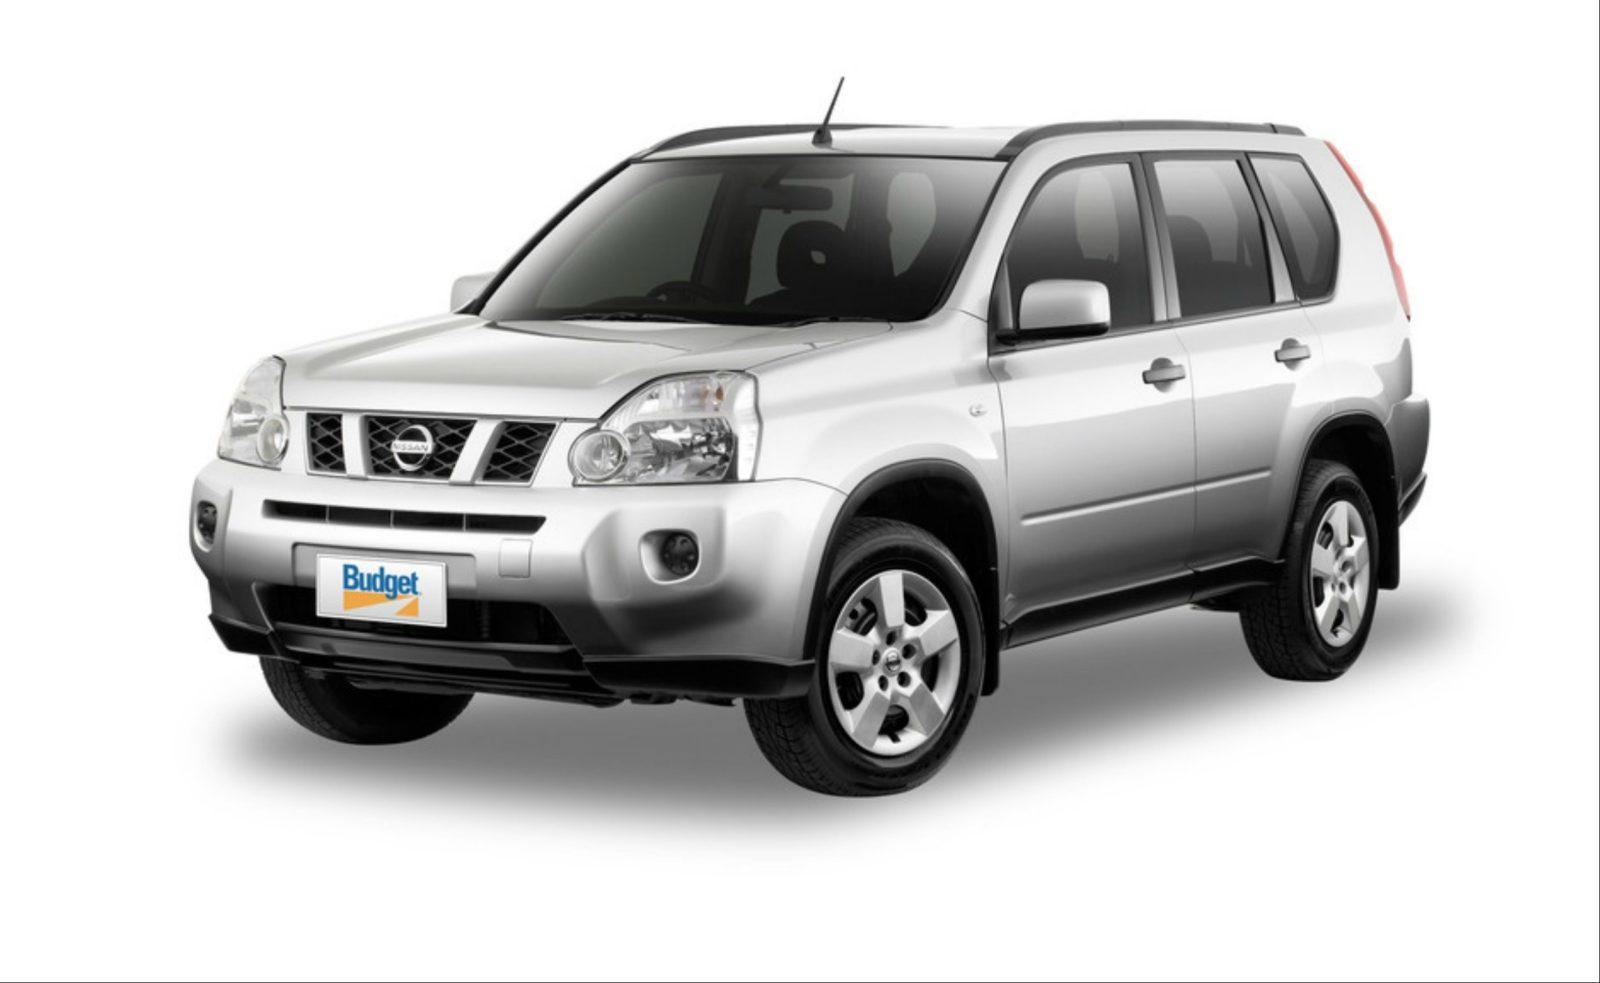 Budget Rent A Car Newman, Newman, Western Australia